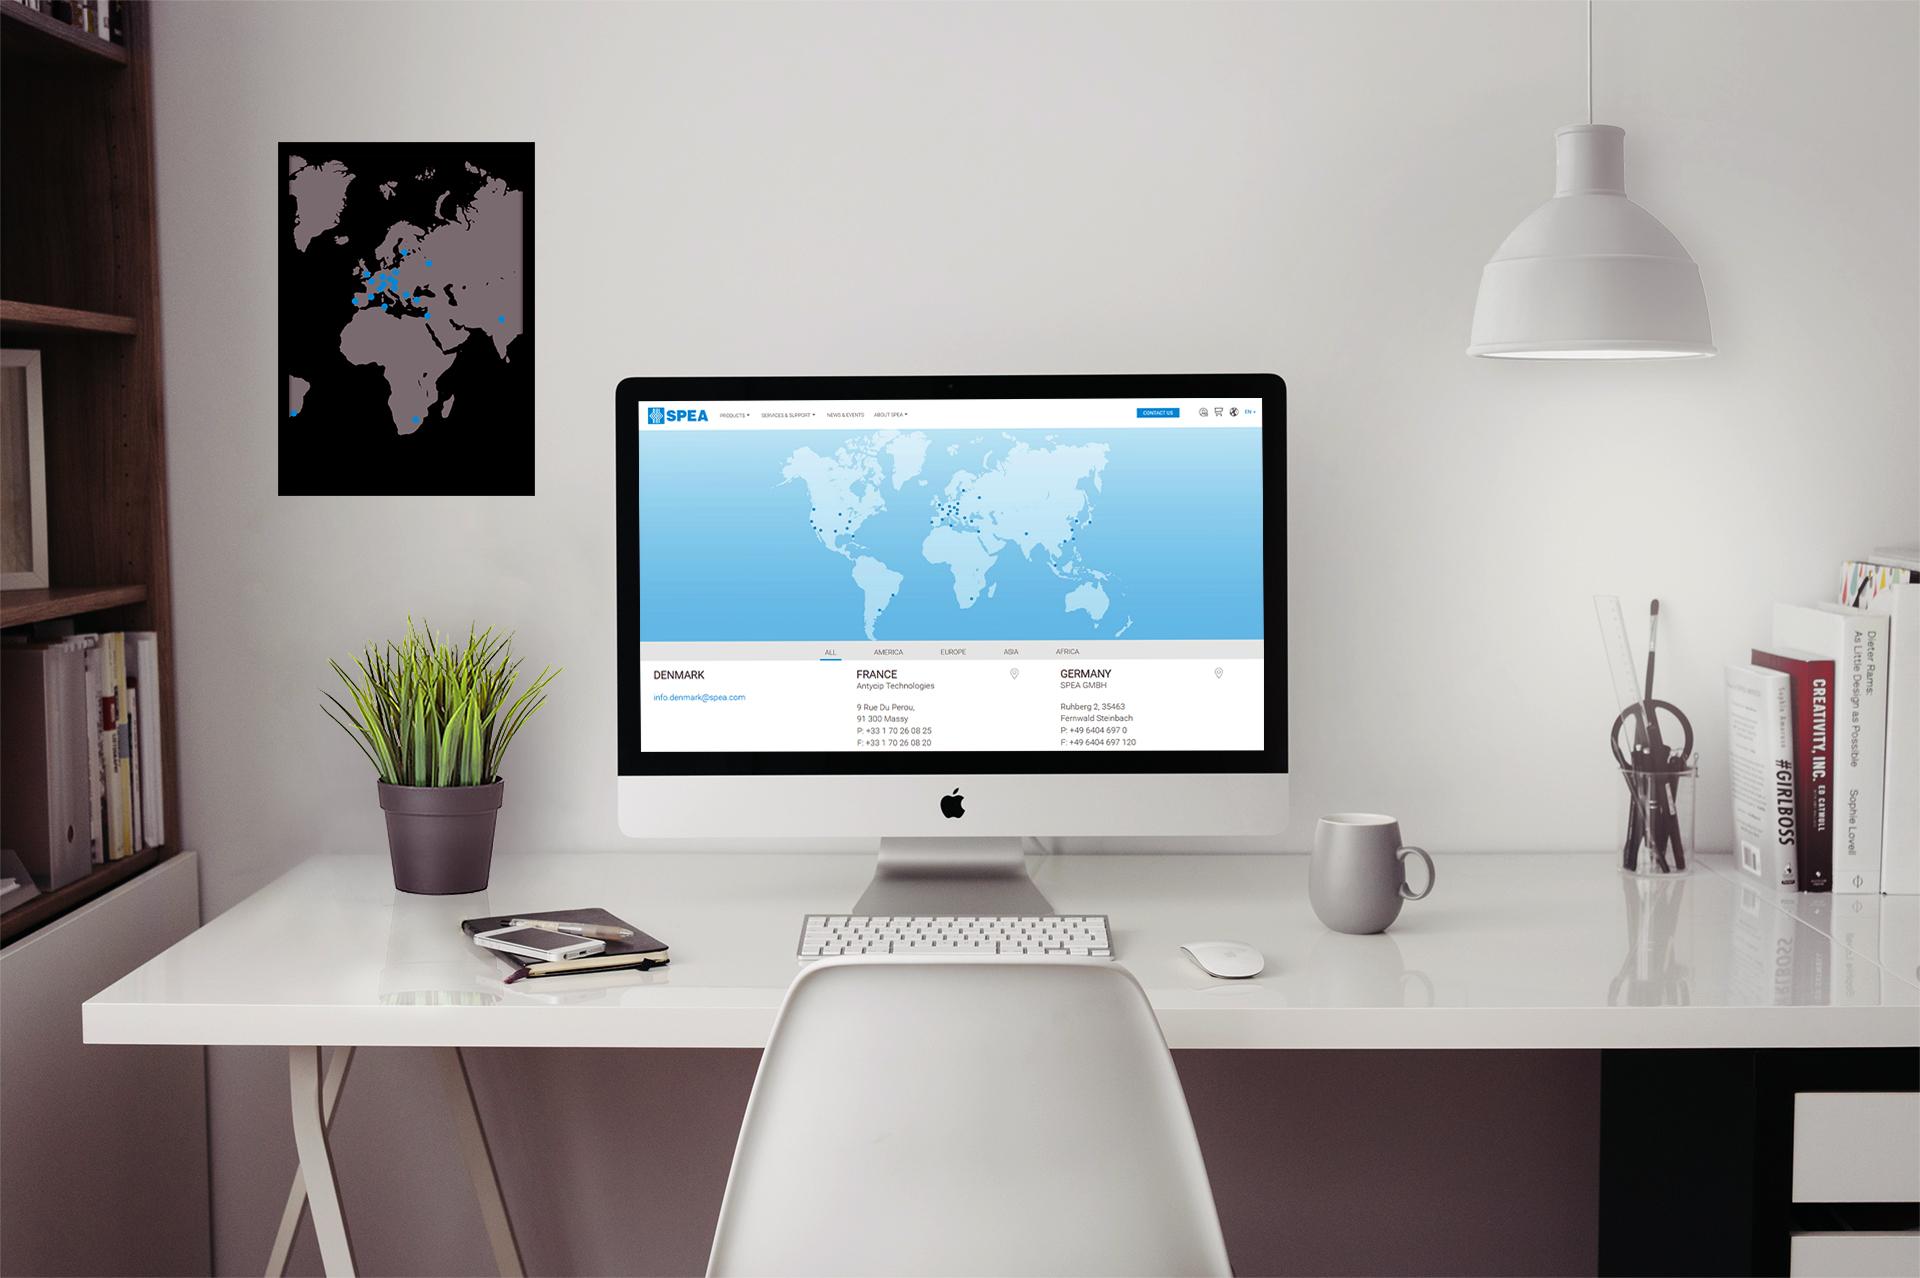 desktop spea